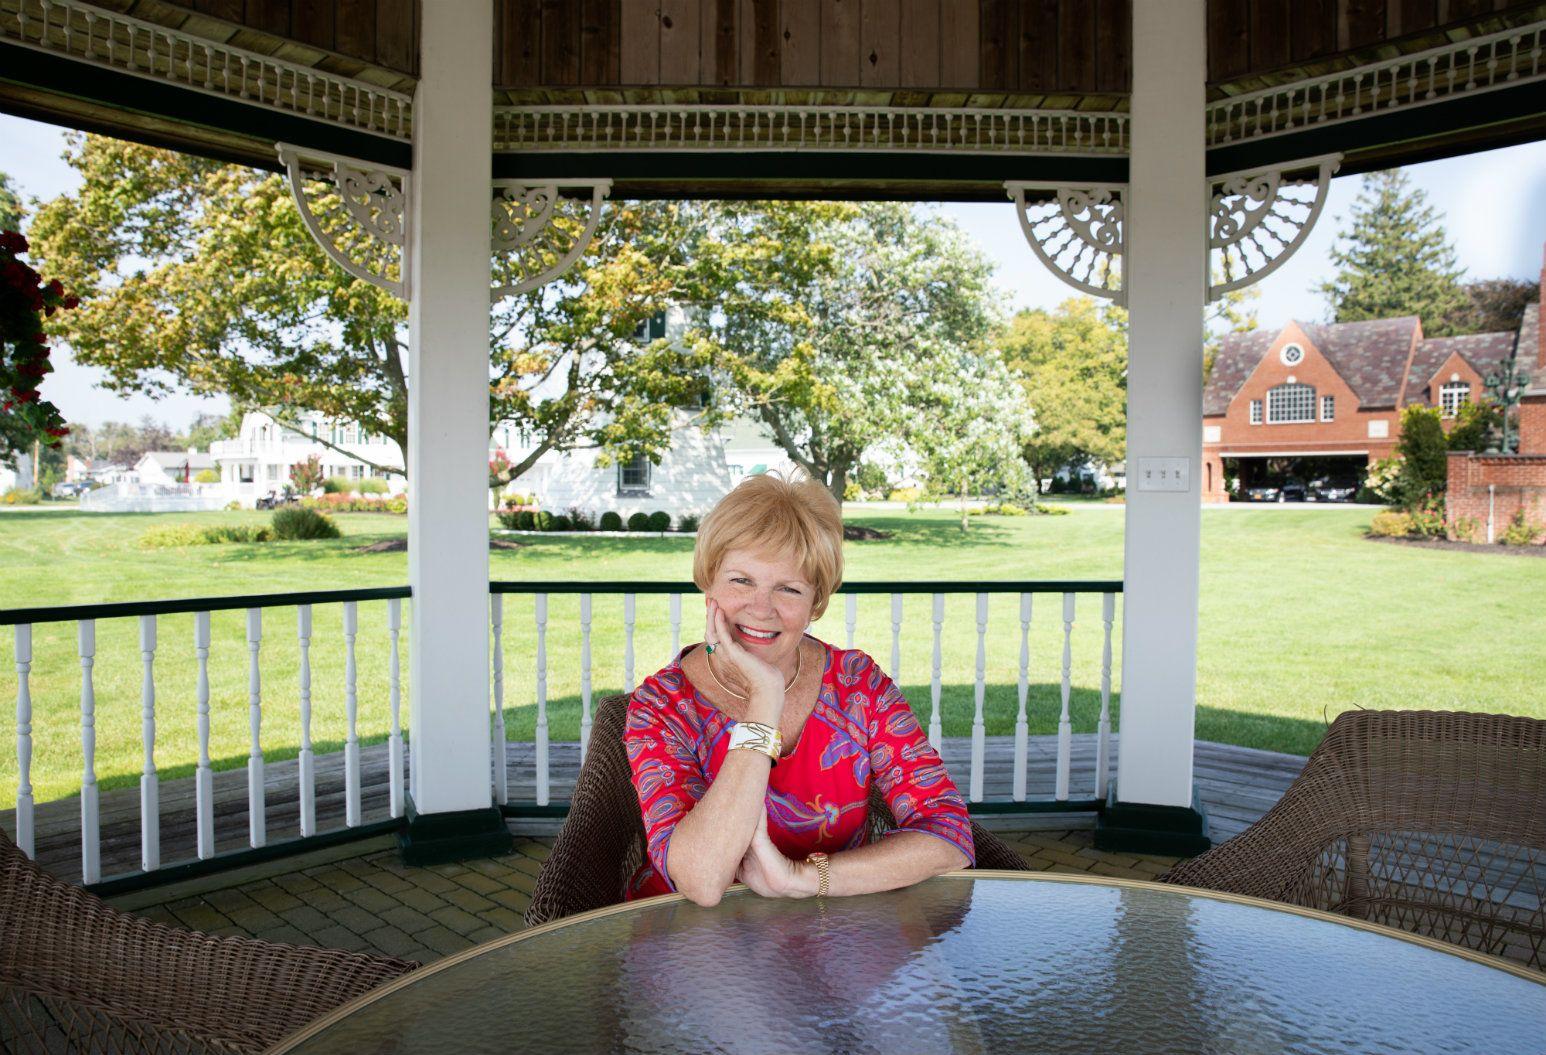 Susan Imbert sits inside a gazebo on a sunny day.